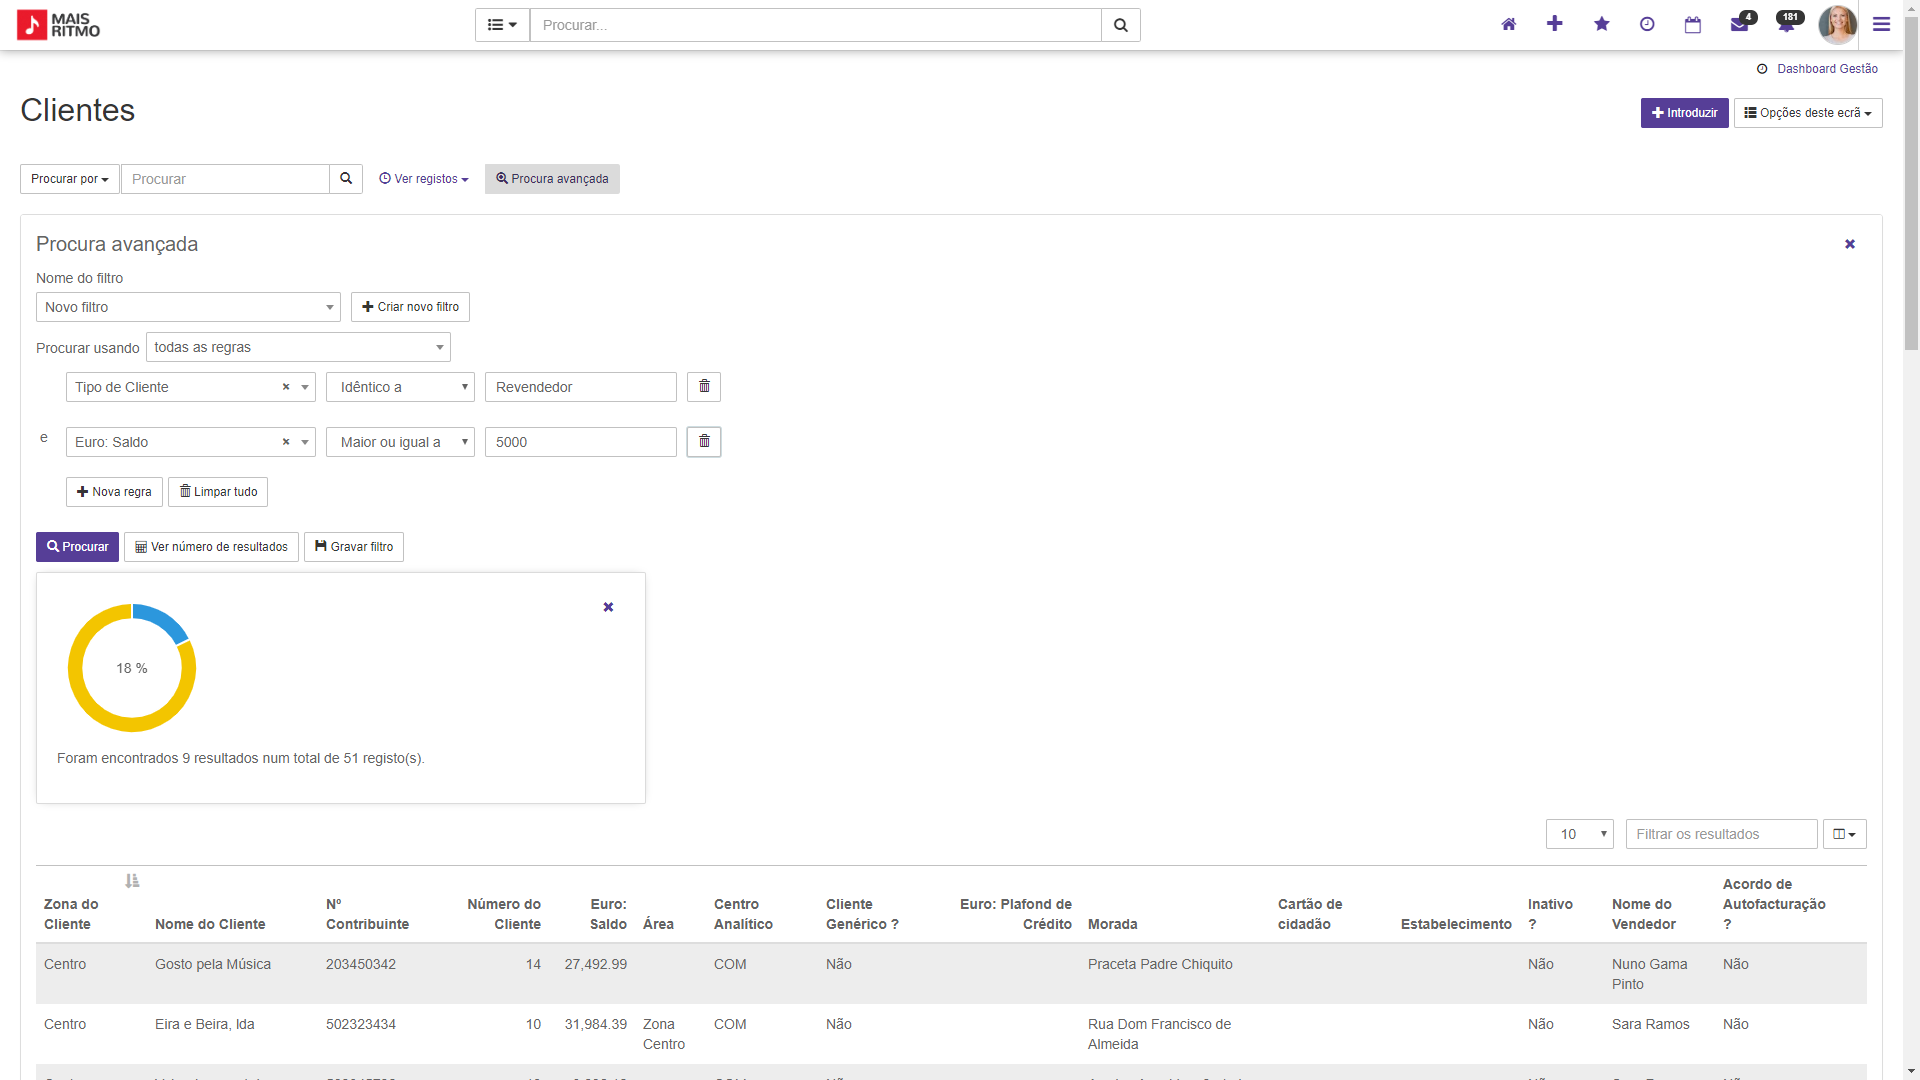 IDIR190828_ UX_UI_filtros_procura_avancada_web_1